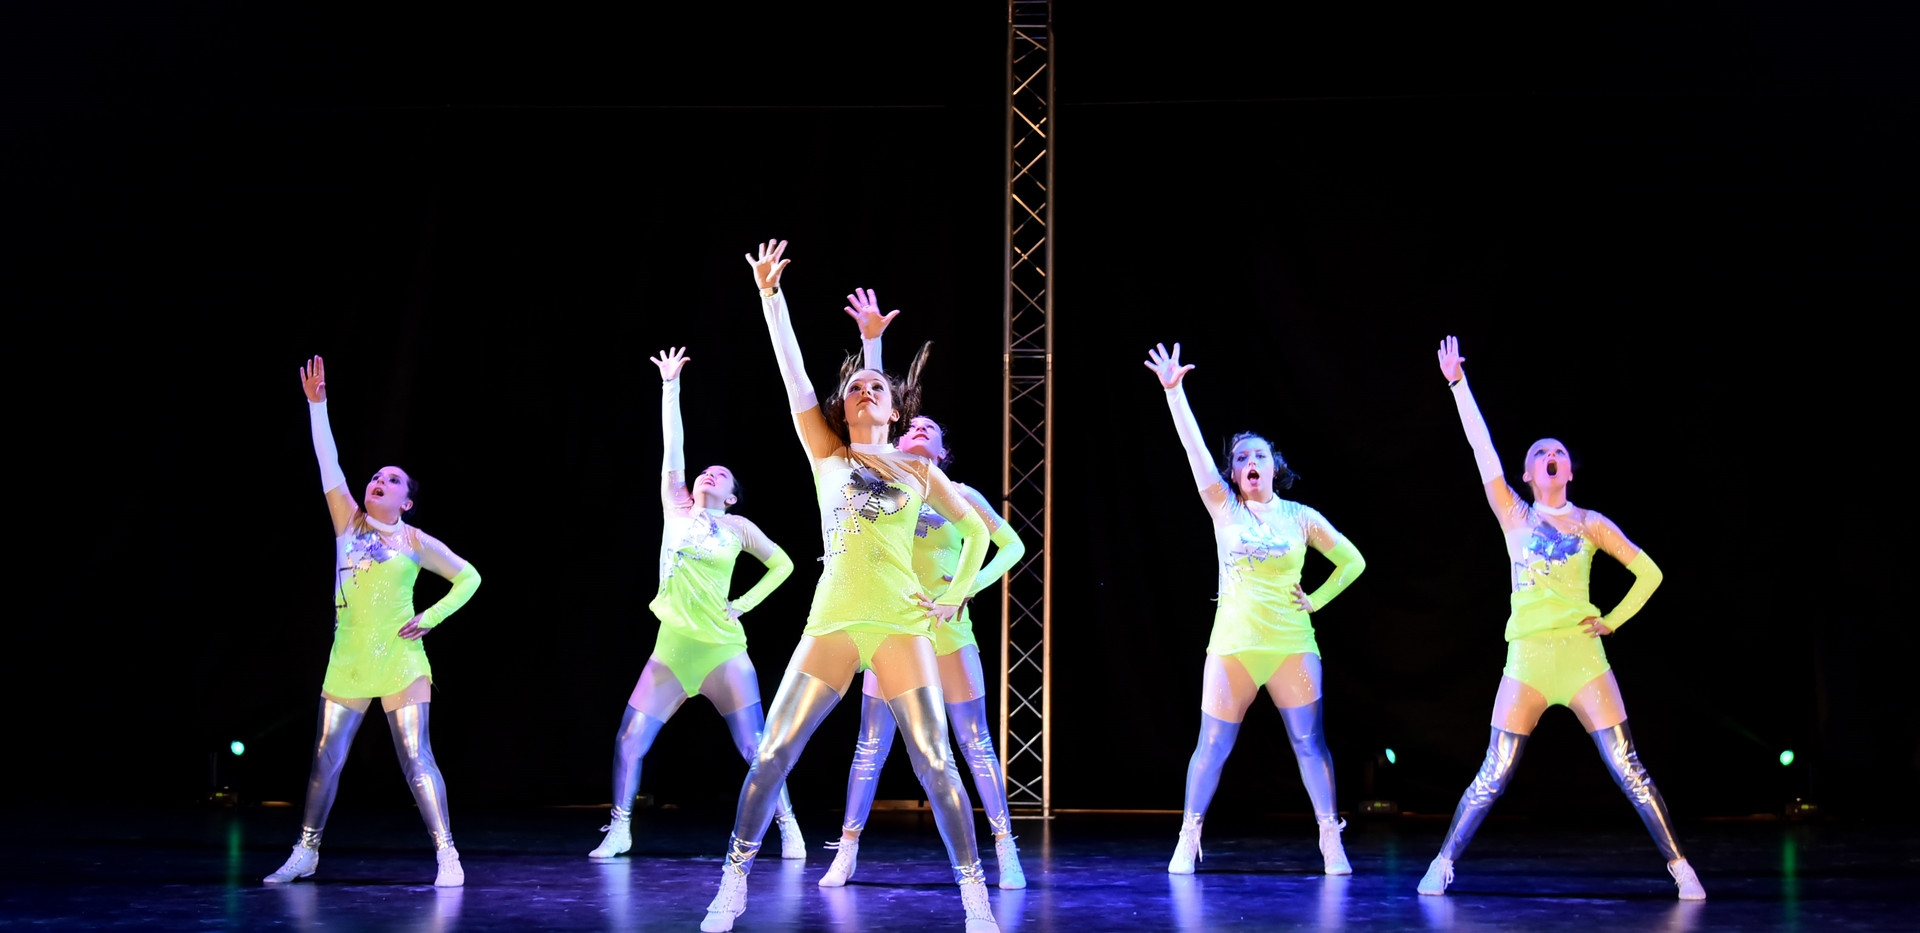 DANCE SHOW 19 - Rocking Girls (4)_GF.jpg